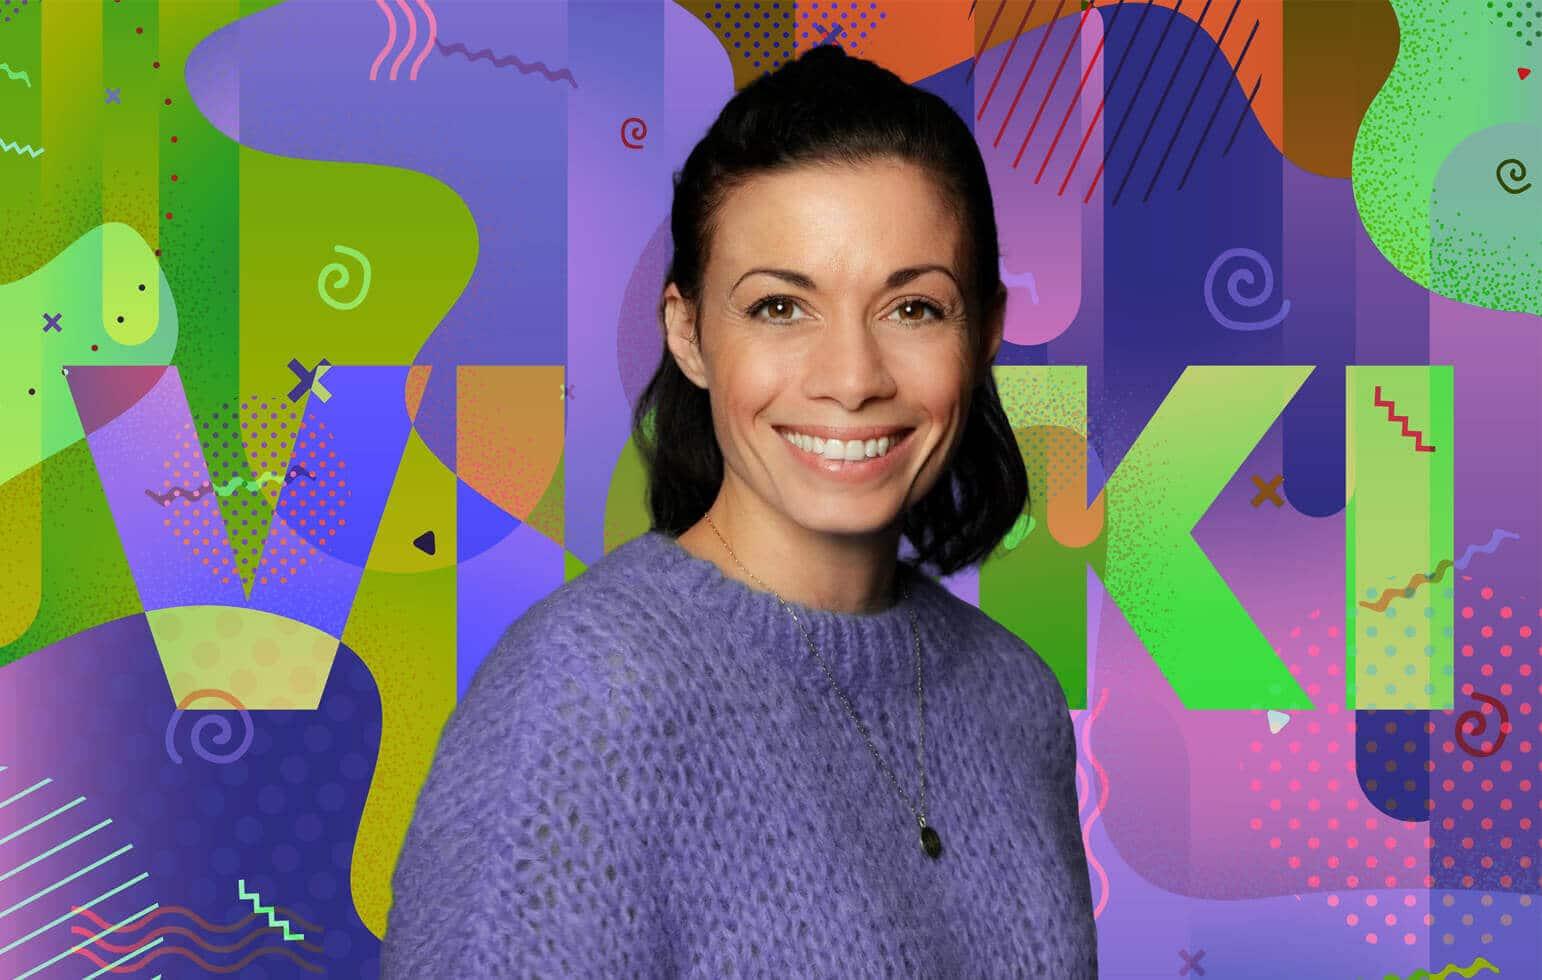 Vicki Kvist Gaulshøj joins Kubbco